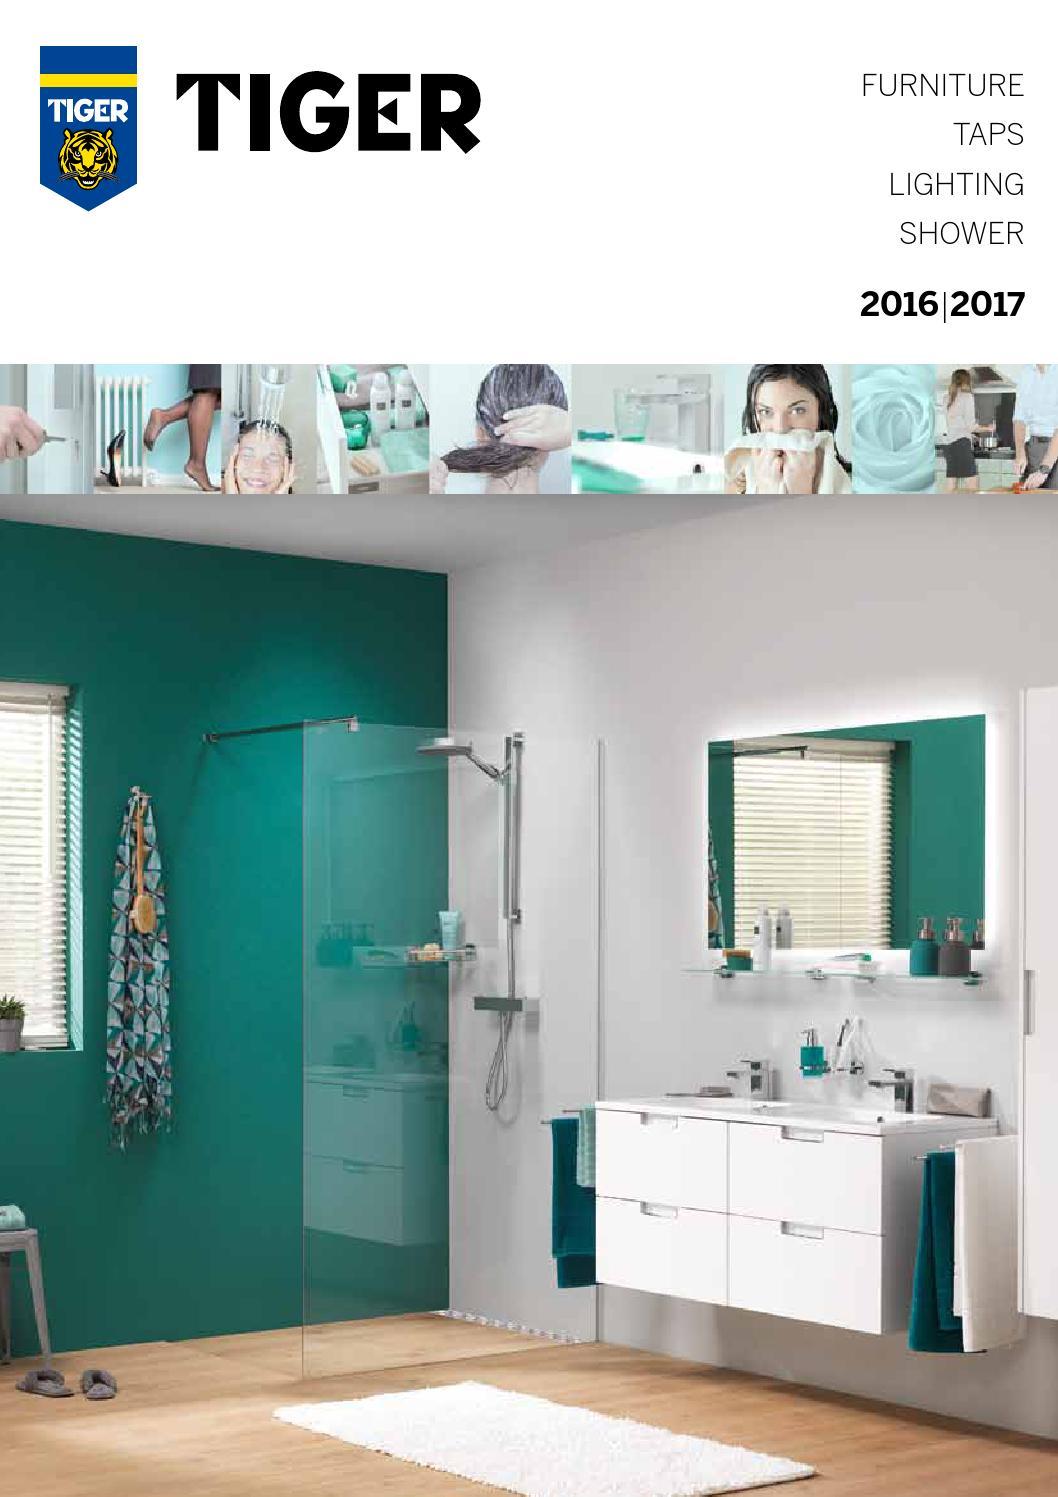 Tiger Bathroom Design Magazine 2016 Furniture Taps Lighting Shower ...